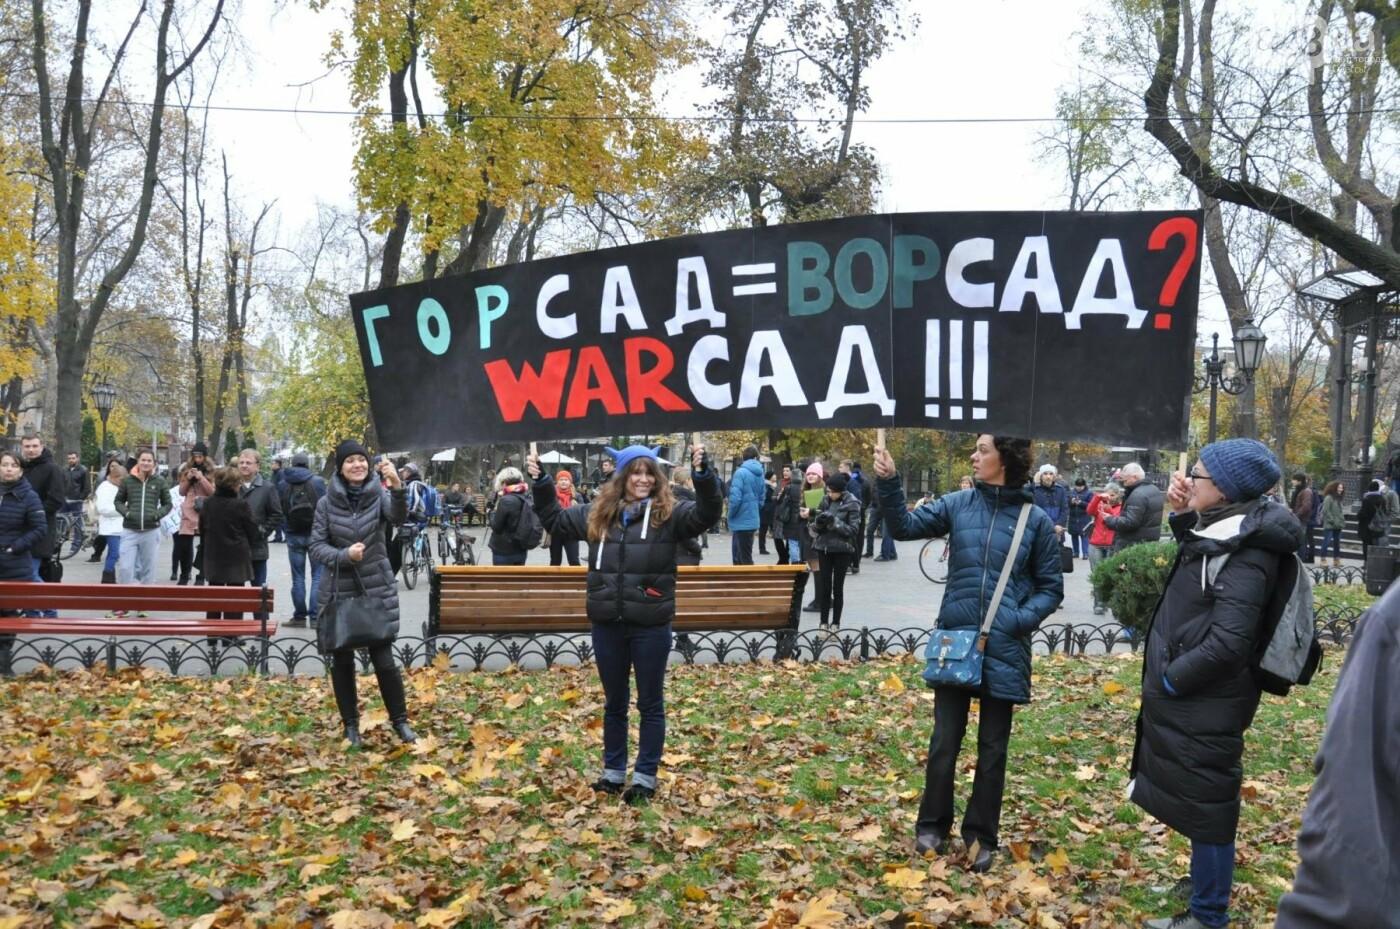 Около 5 сотен одесситов протестовали против застройки Горсада (ФОТО) , фото-26